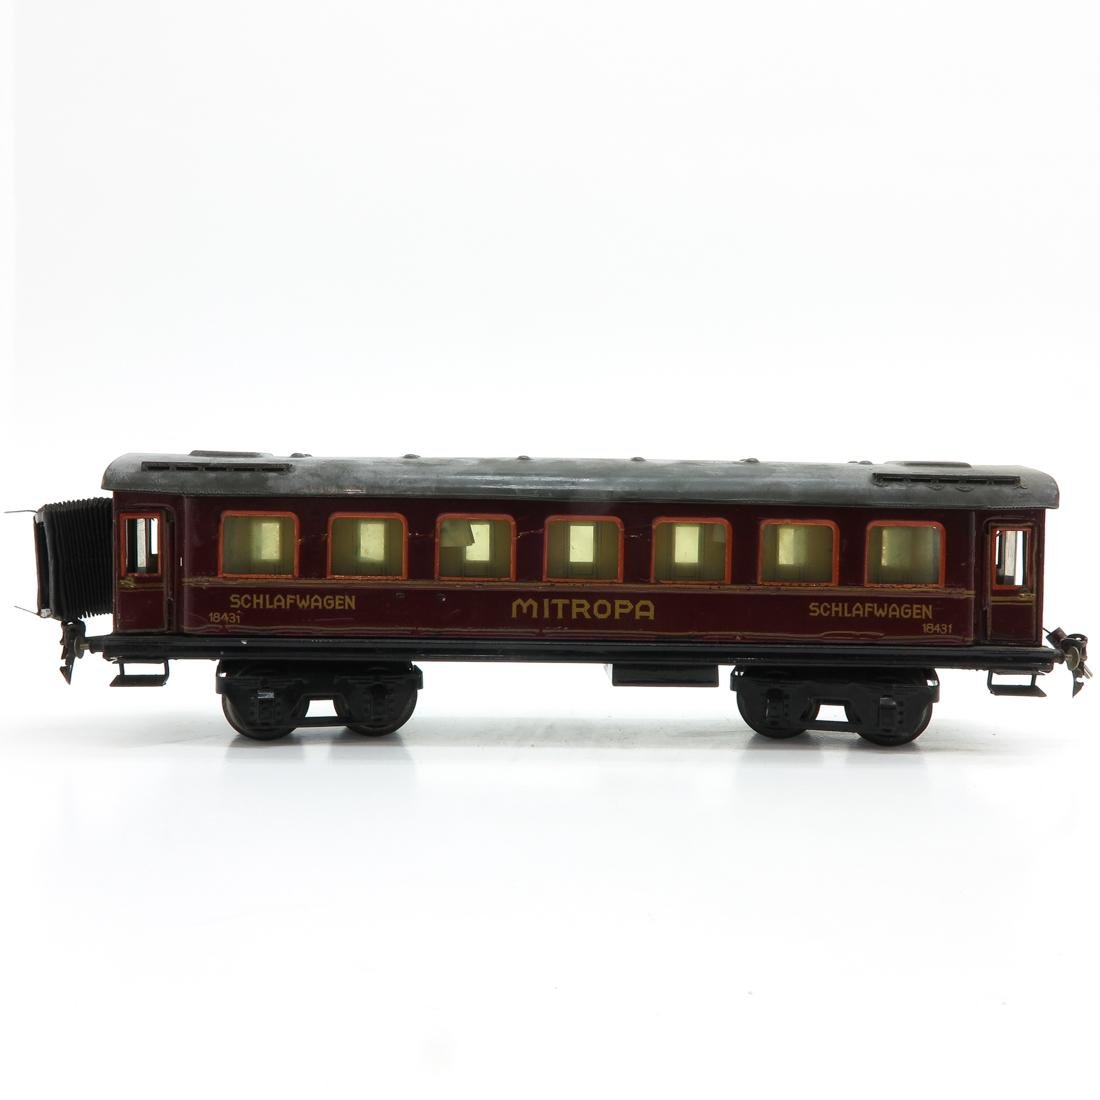 Vintage Marklin Mitropa Passenger Car